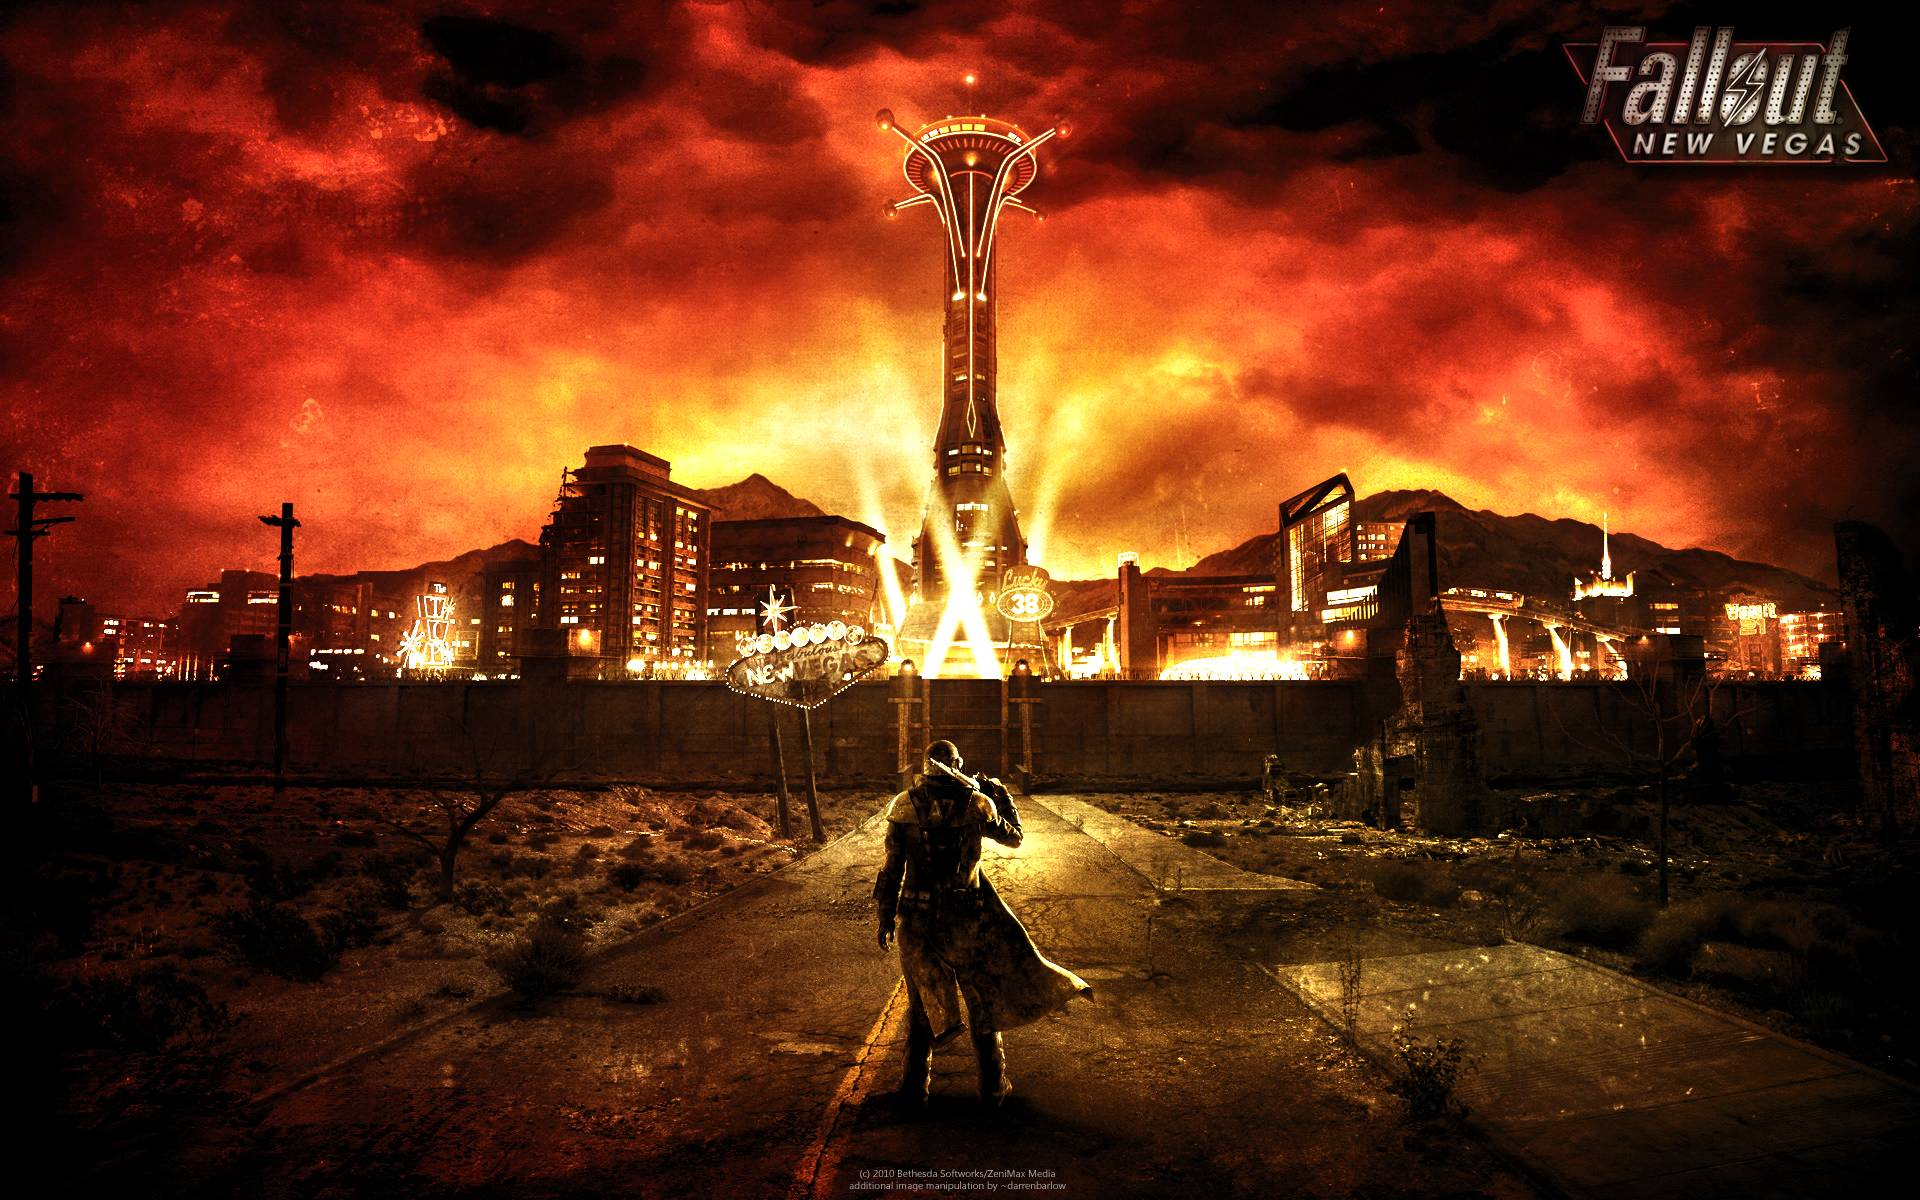 Fallout New Vegas Backgrounds